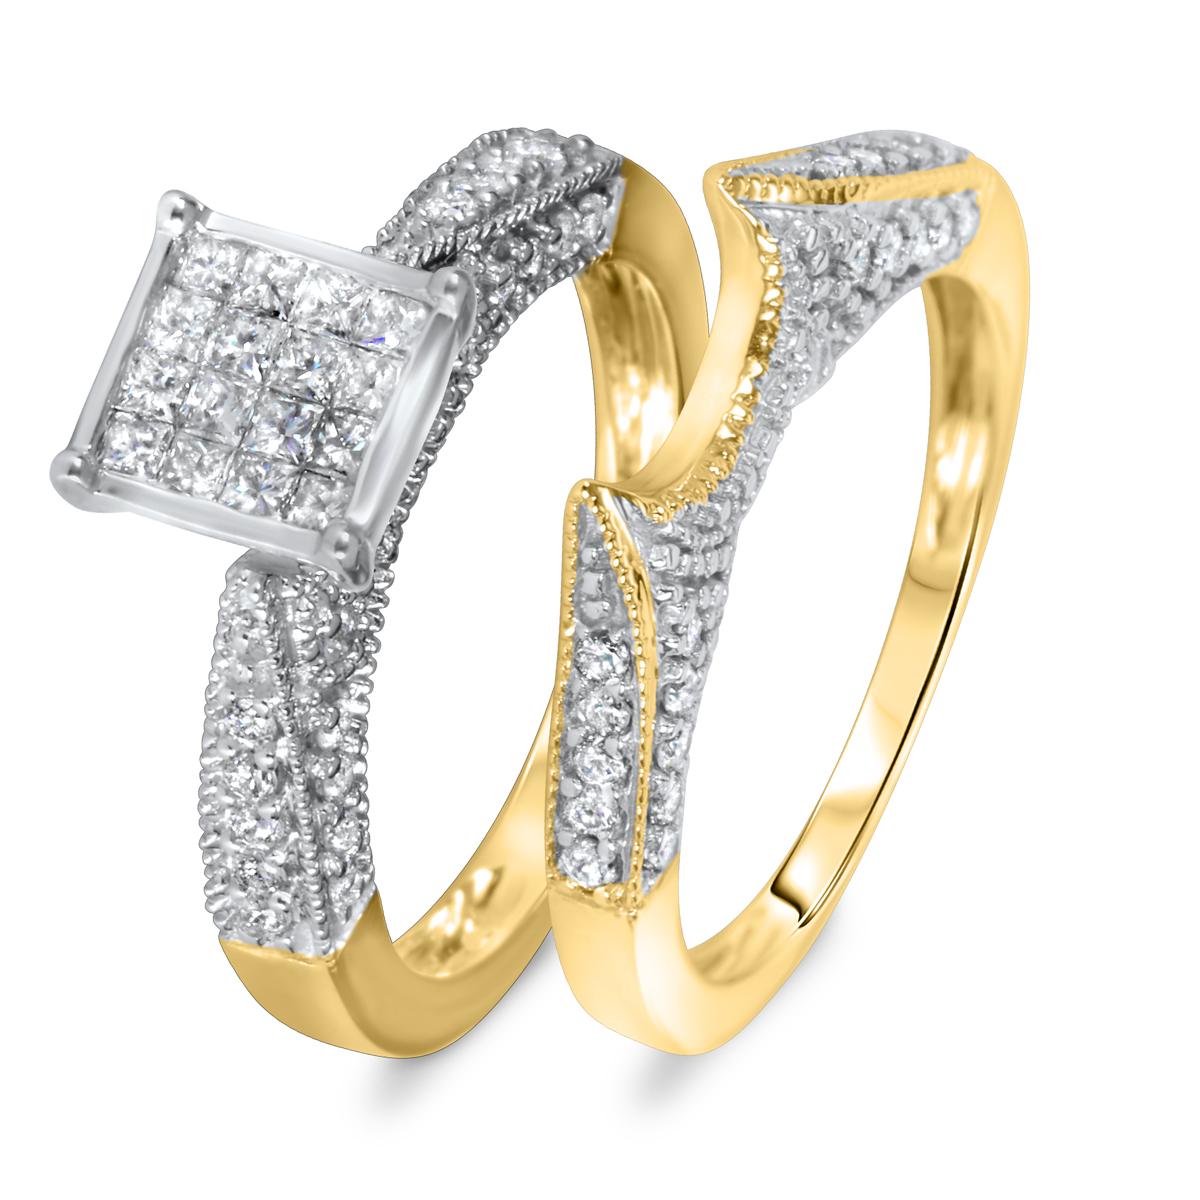 1 CT. T.W. Diamond Women's Bridal Wedding Ring Set 14K Yellow Gold